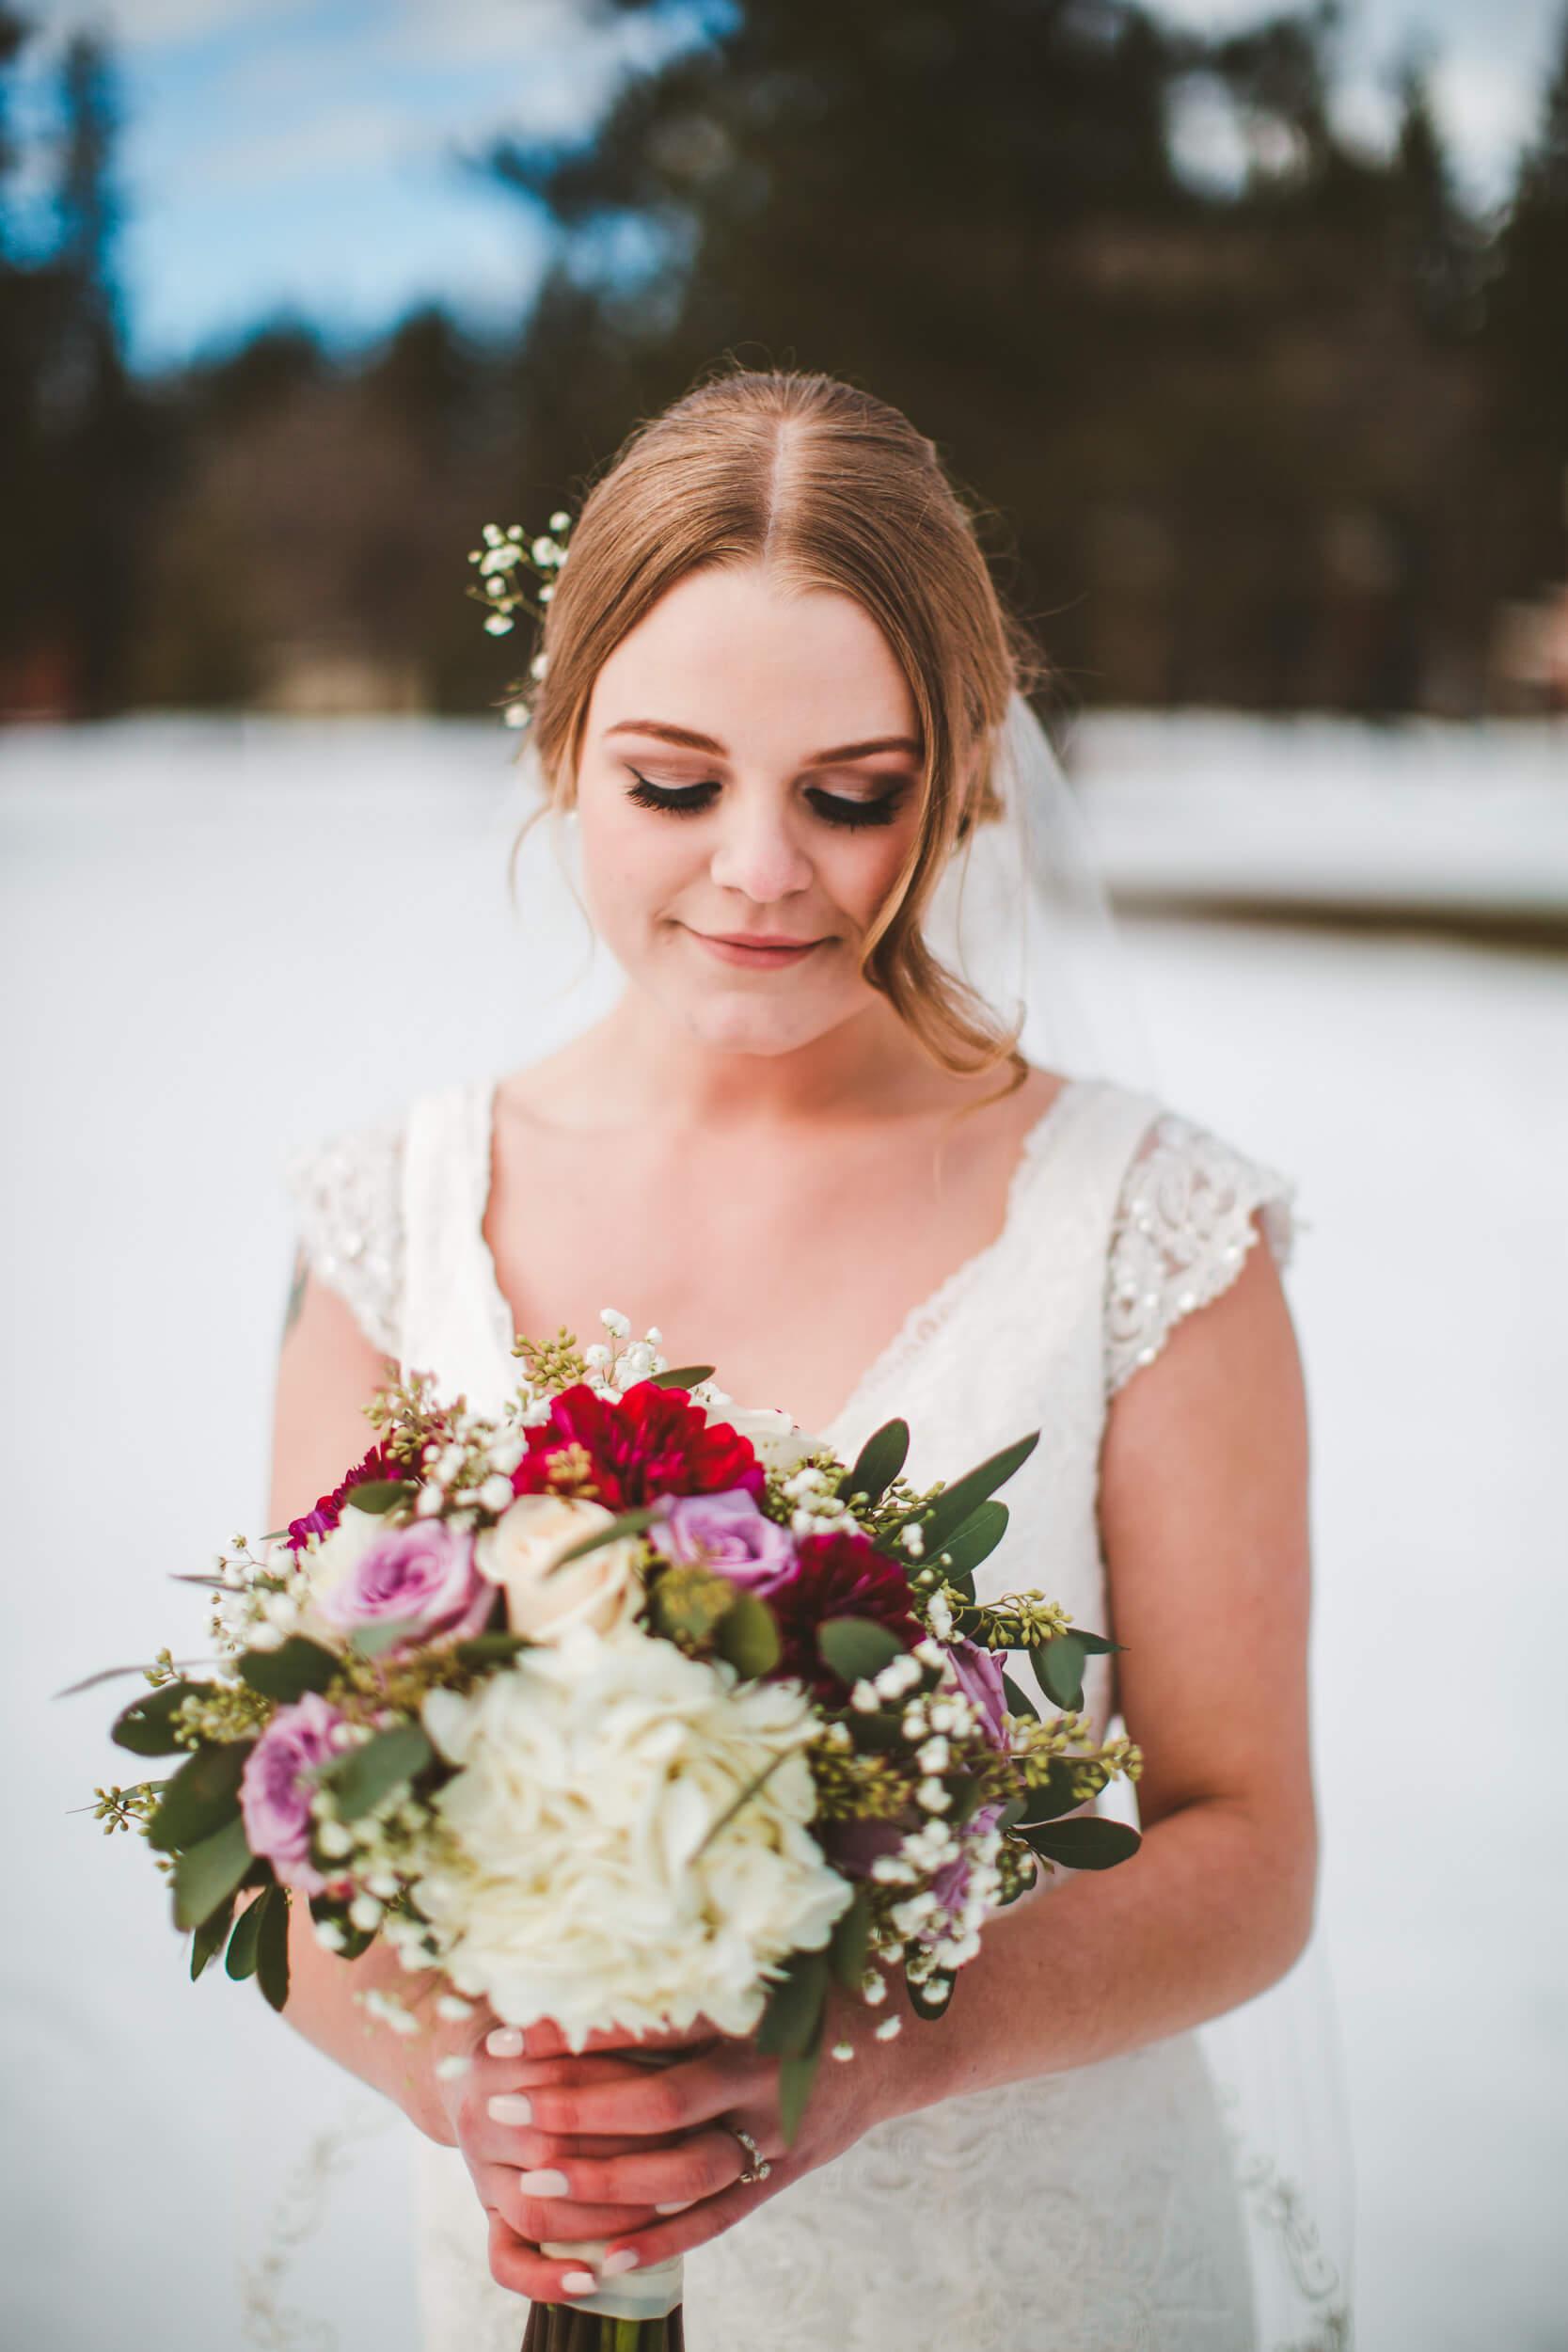 mukogawa winter wedding in spokane (114).jpg